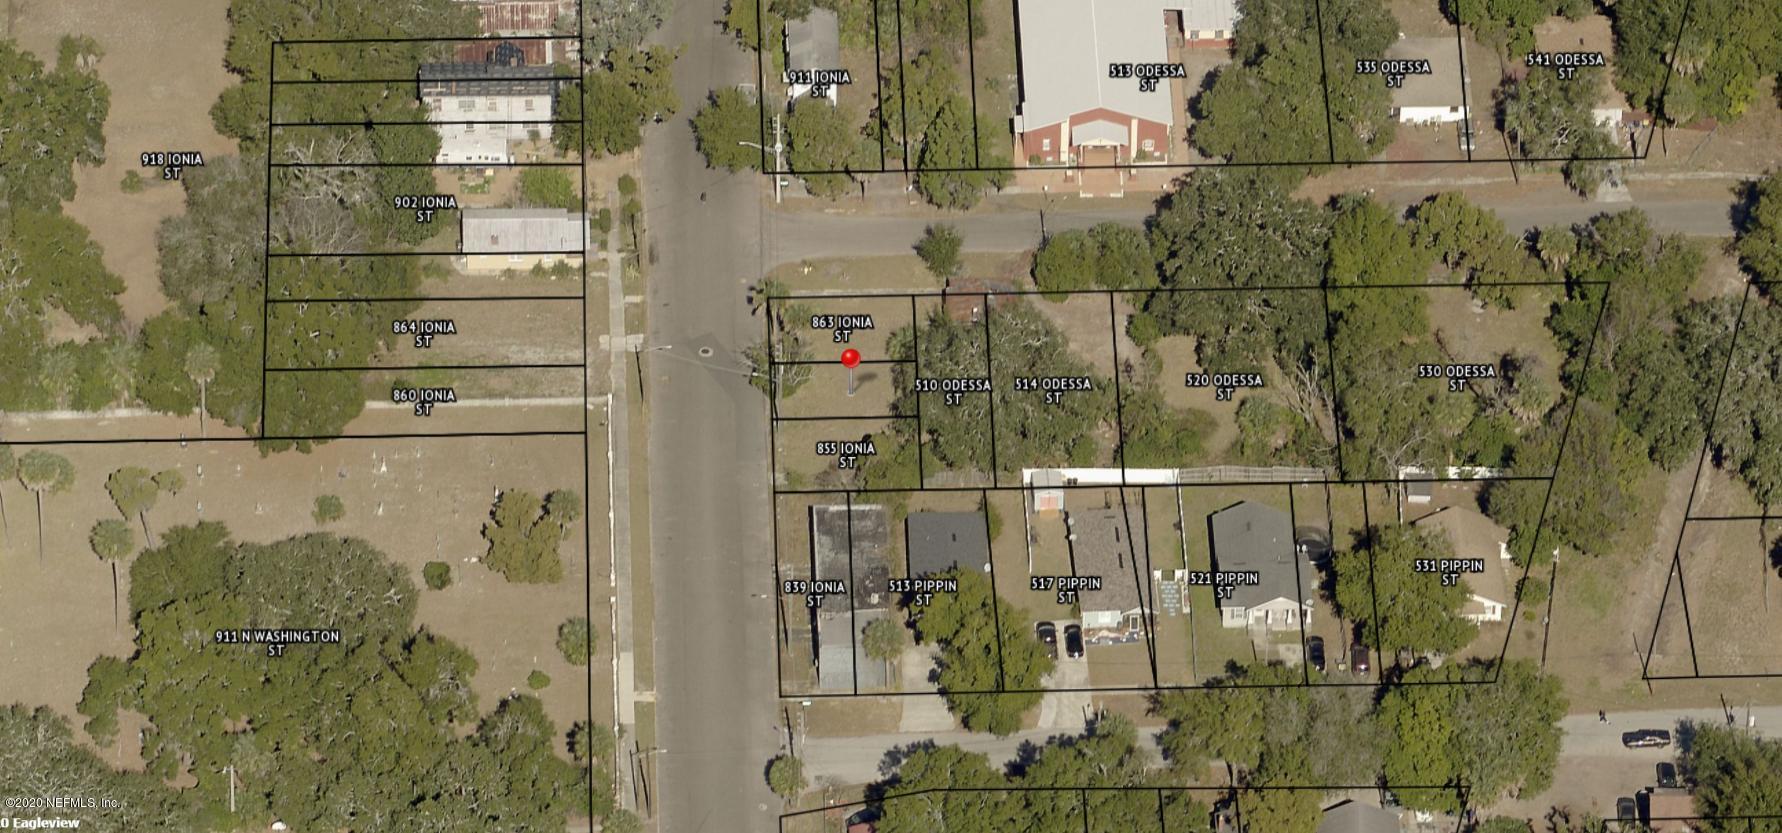 0 IONIA, JACKSONVILLE, FLORIDA 32206, ,Vacant land,For sale,IONIA,1082744